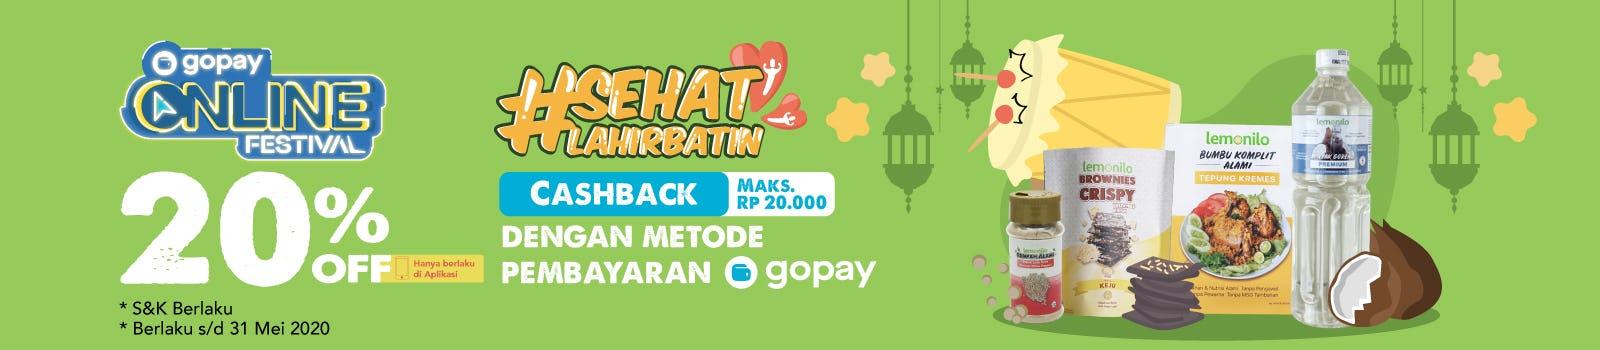 Promo GoPay Online Festival Ramadan